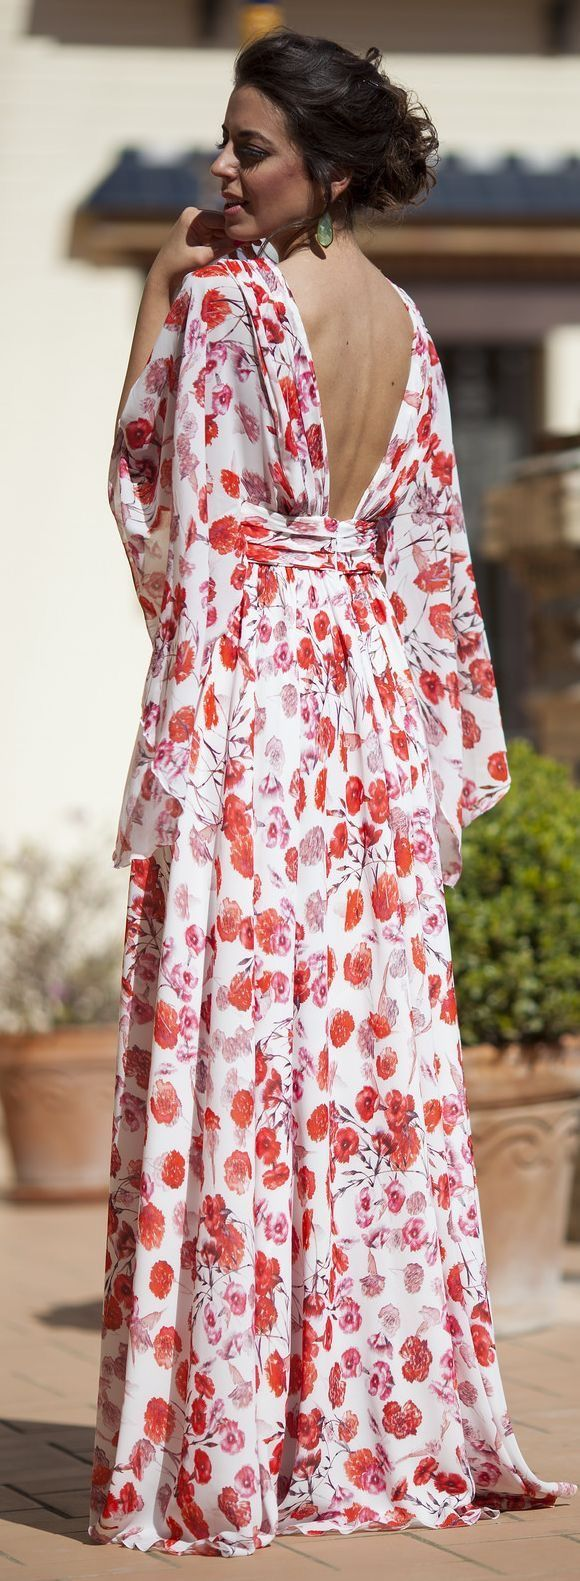 Pin de Ri W. en DRESSES | Pinterest